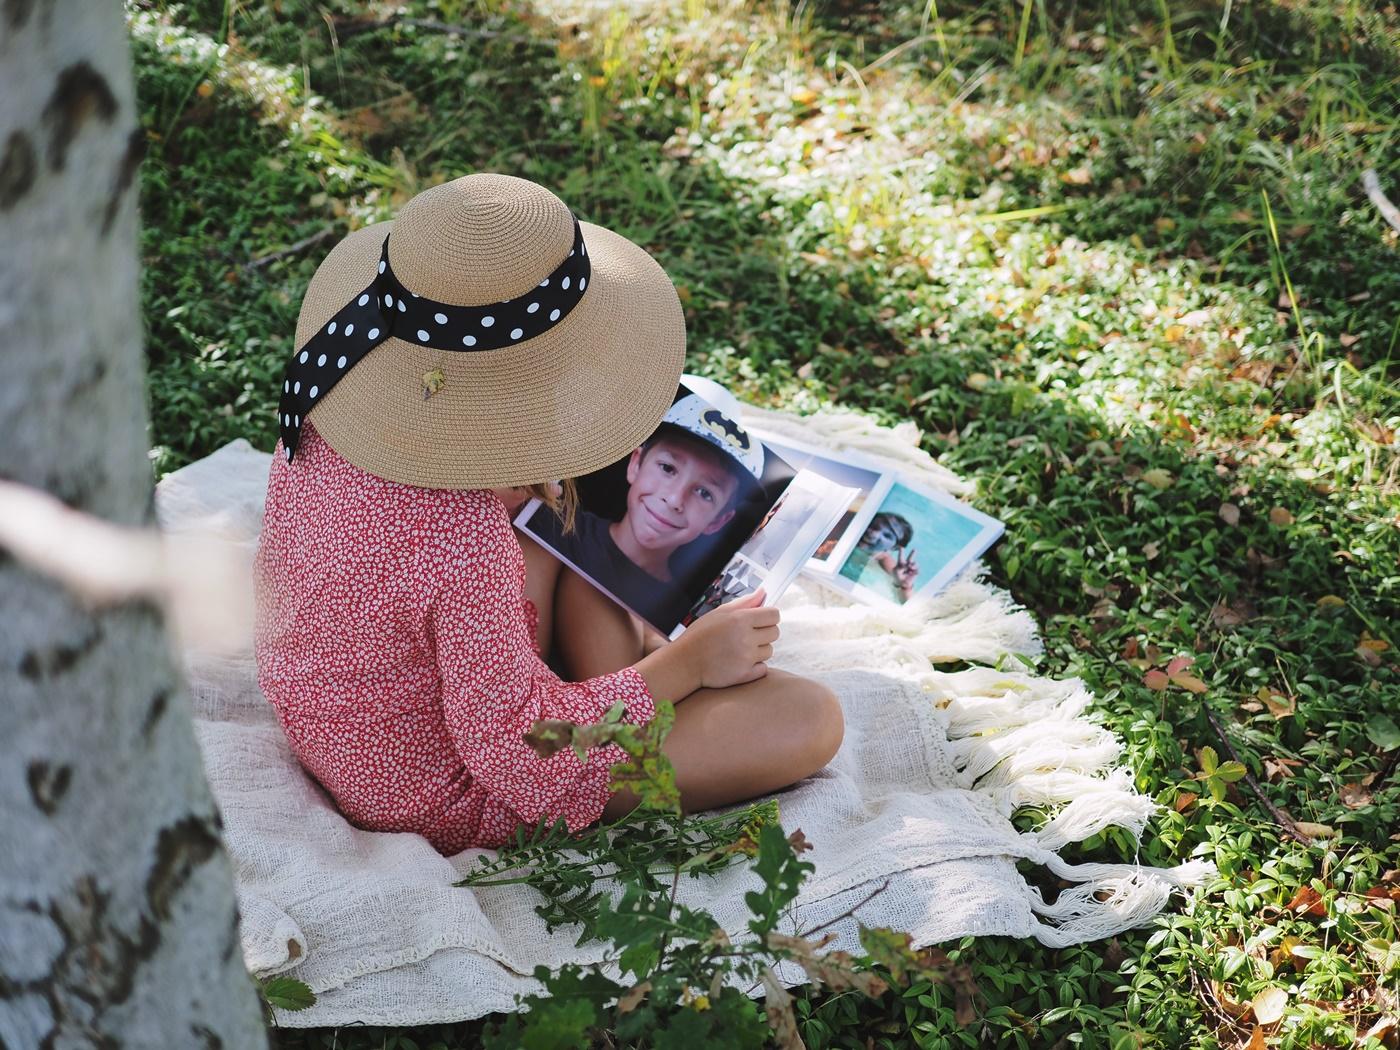 fotoksiążka pixbook